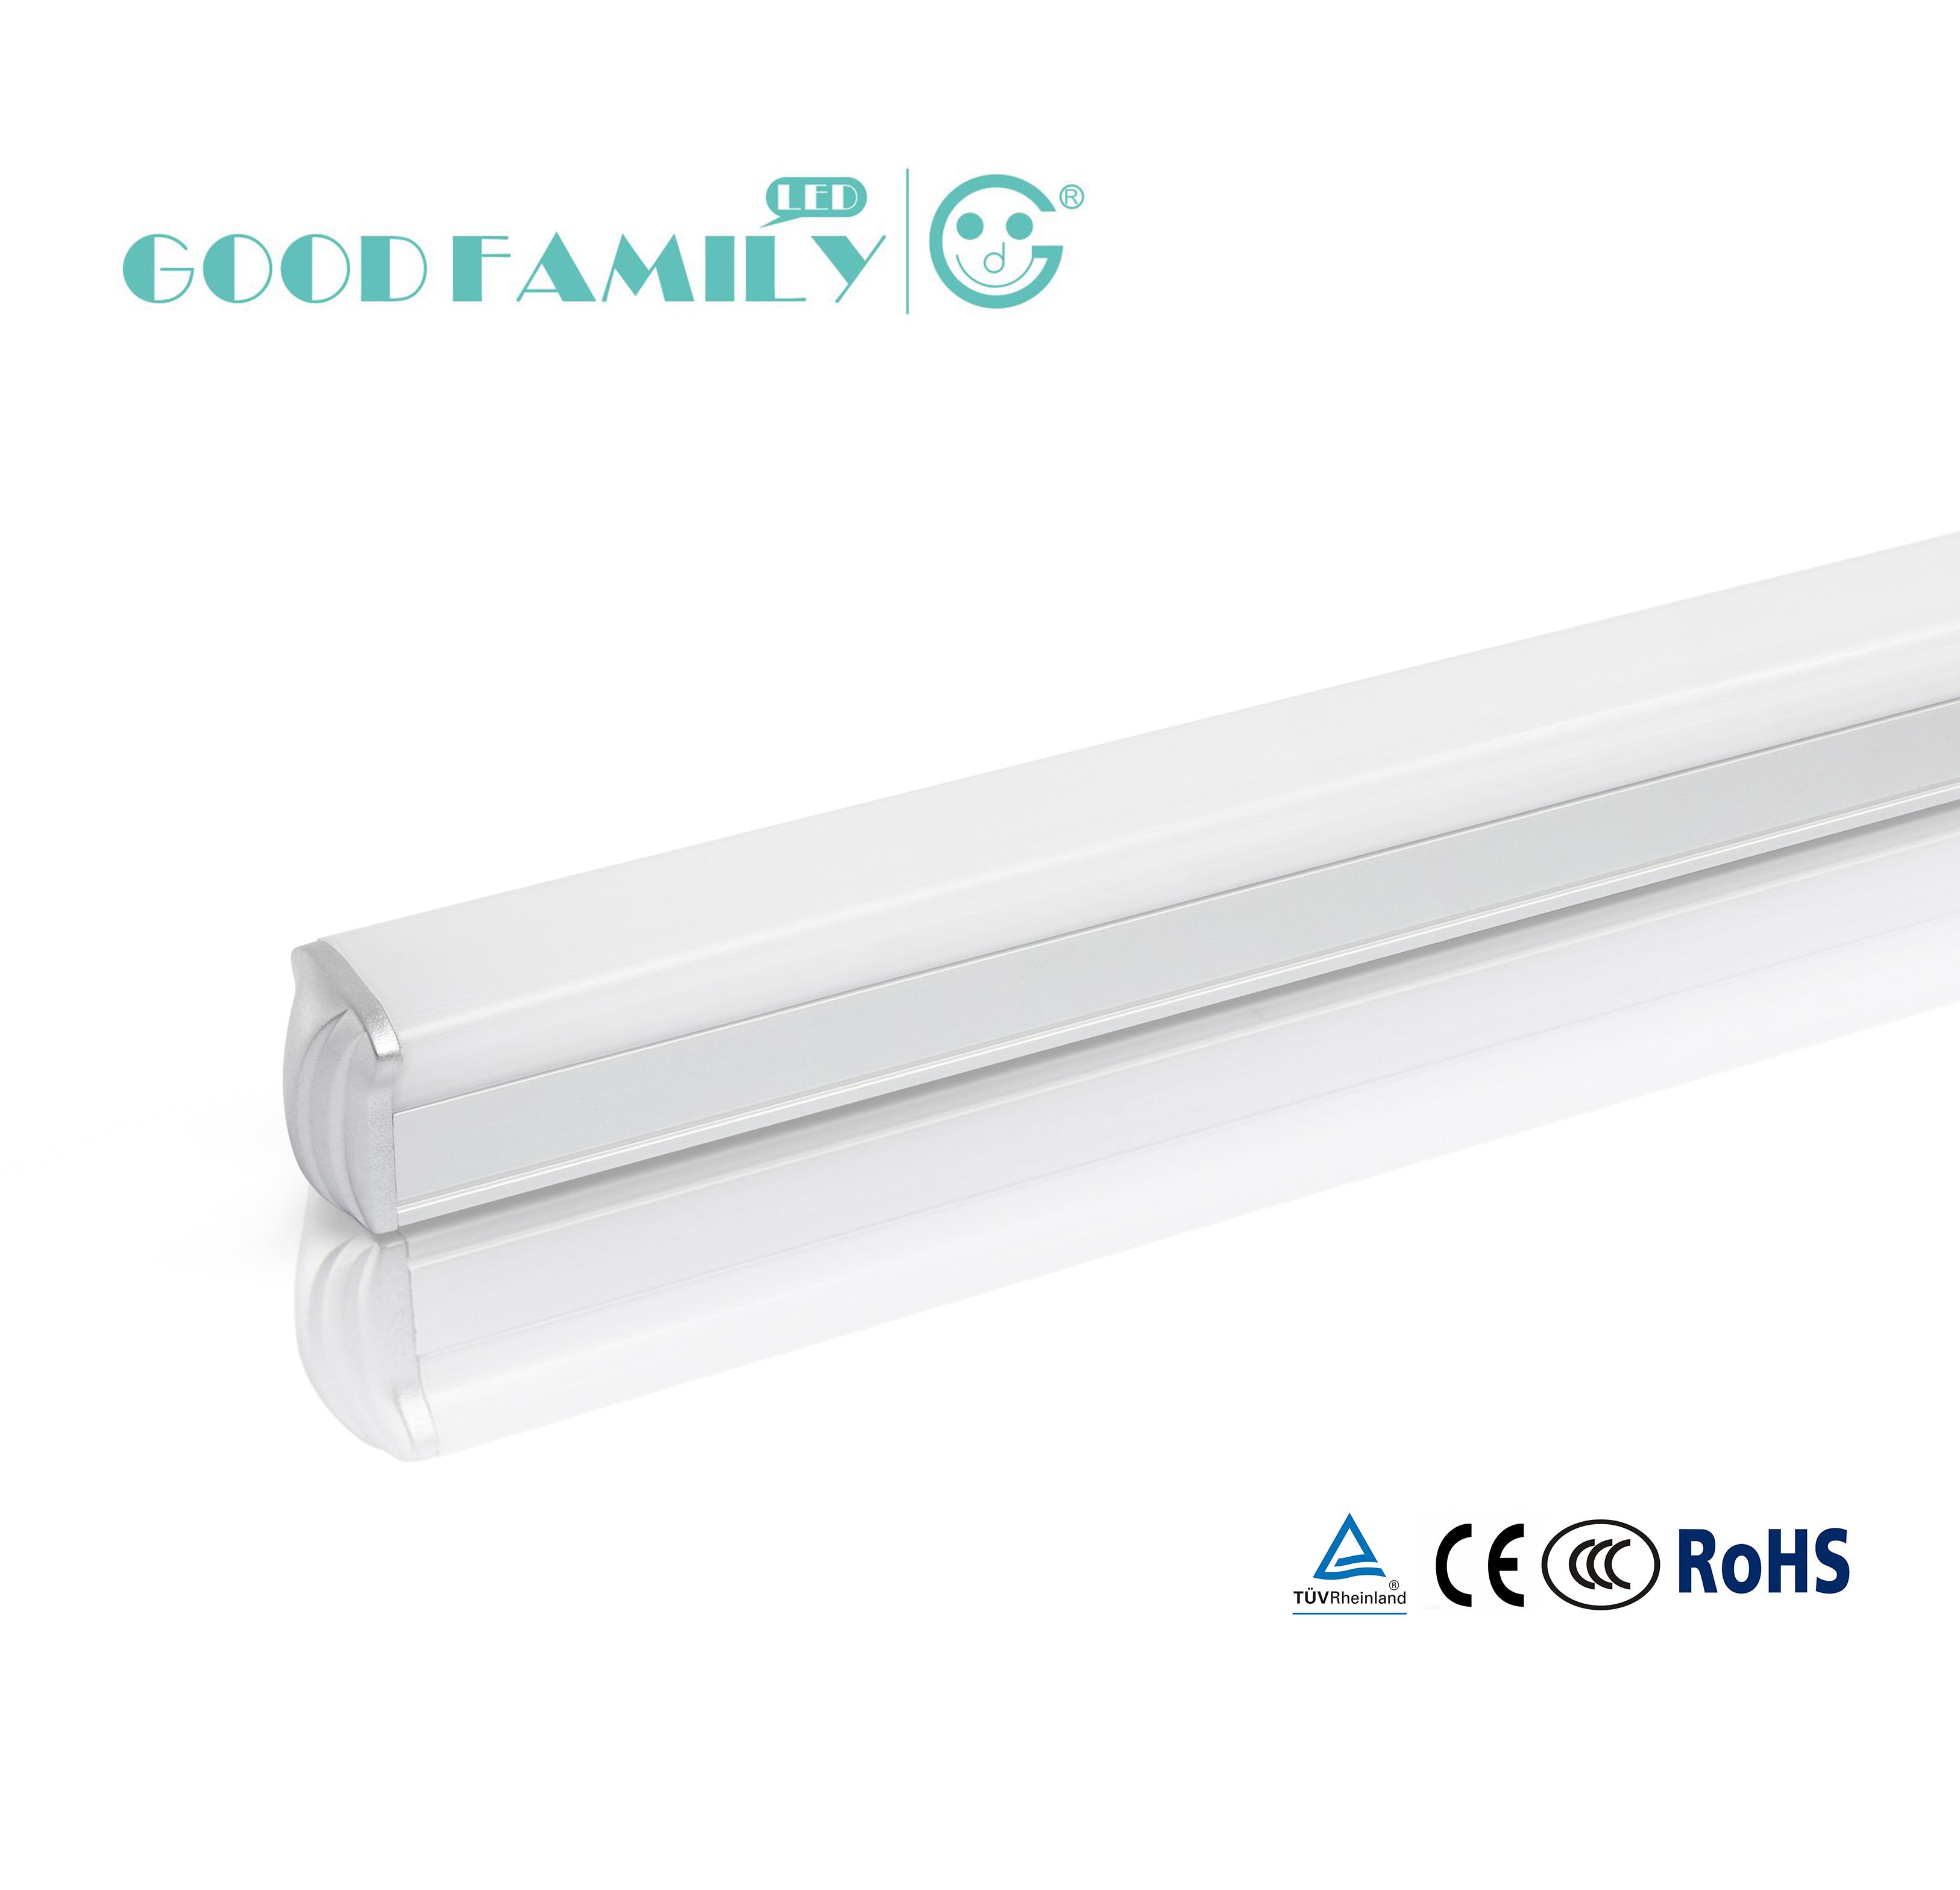 4 feet T5 led tube light with high lumens